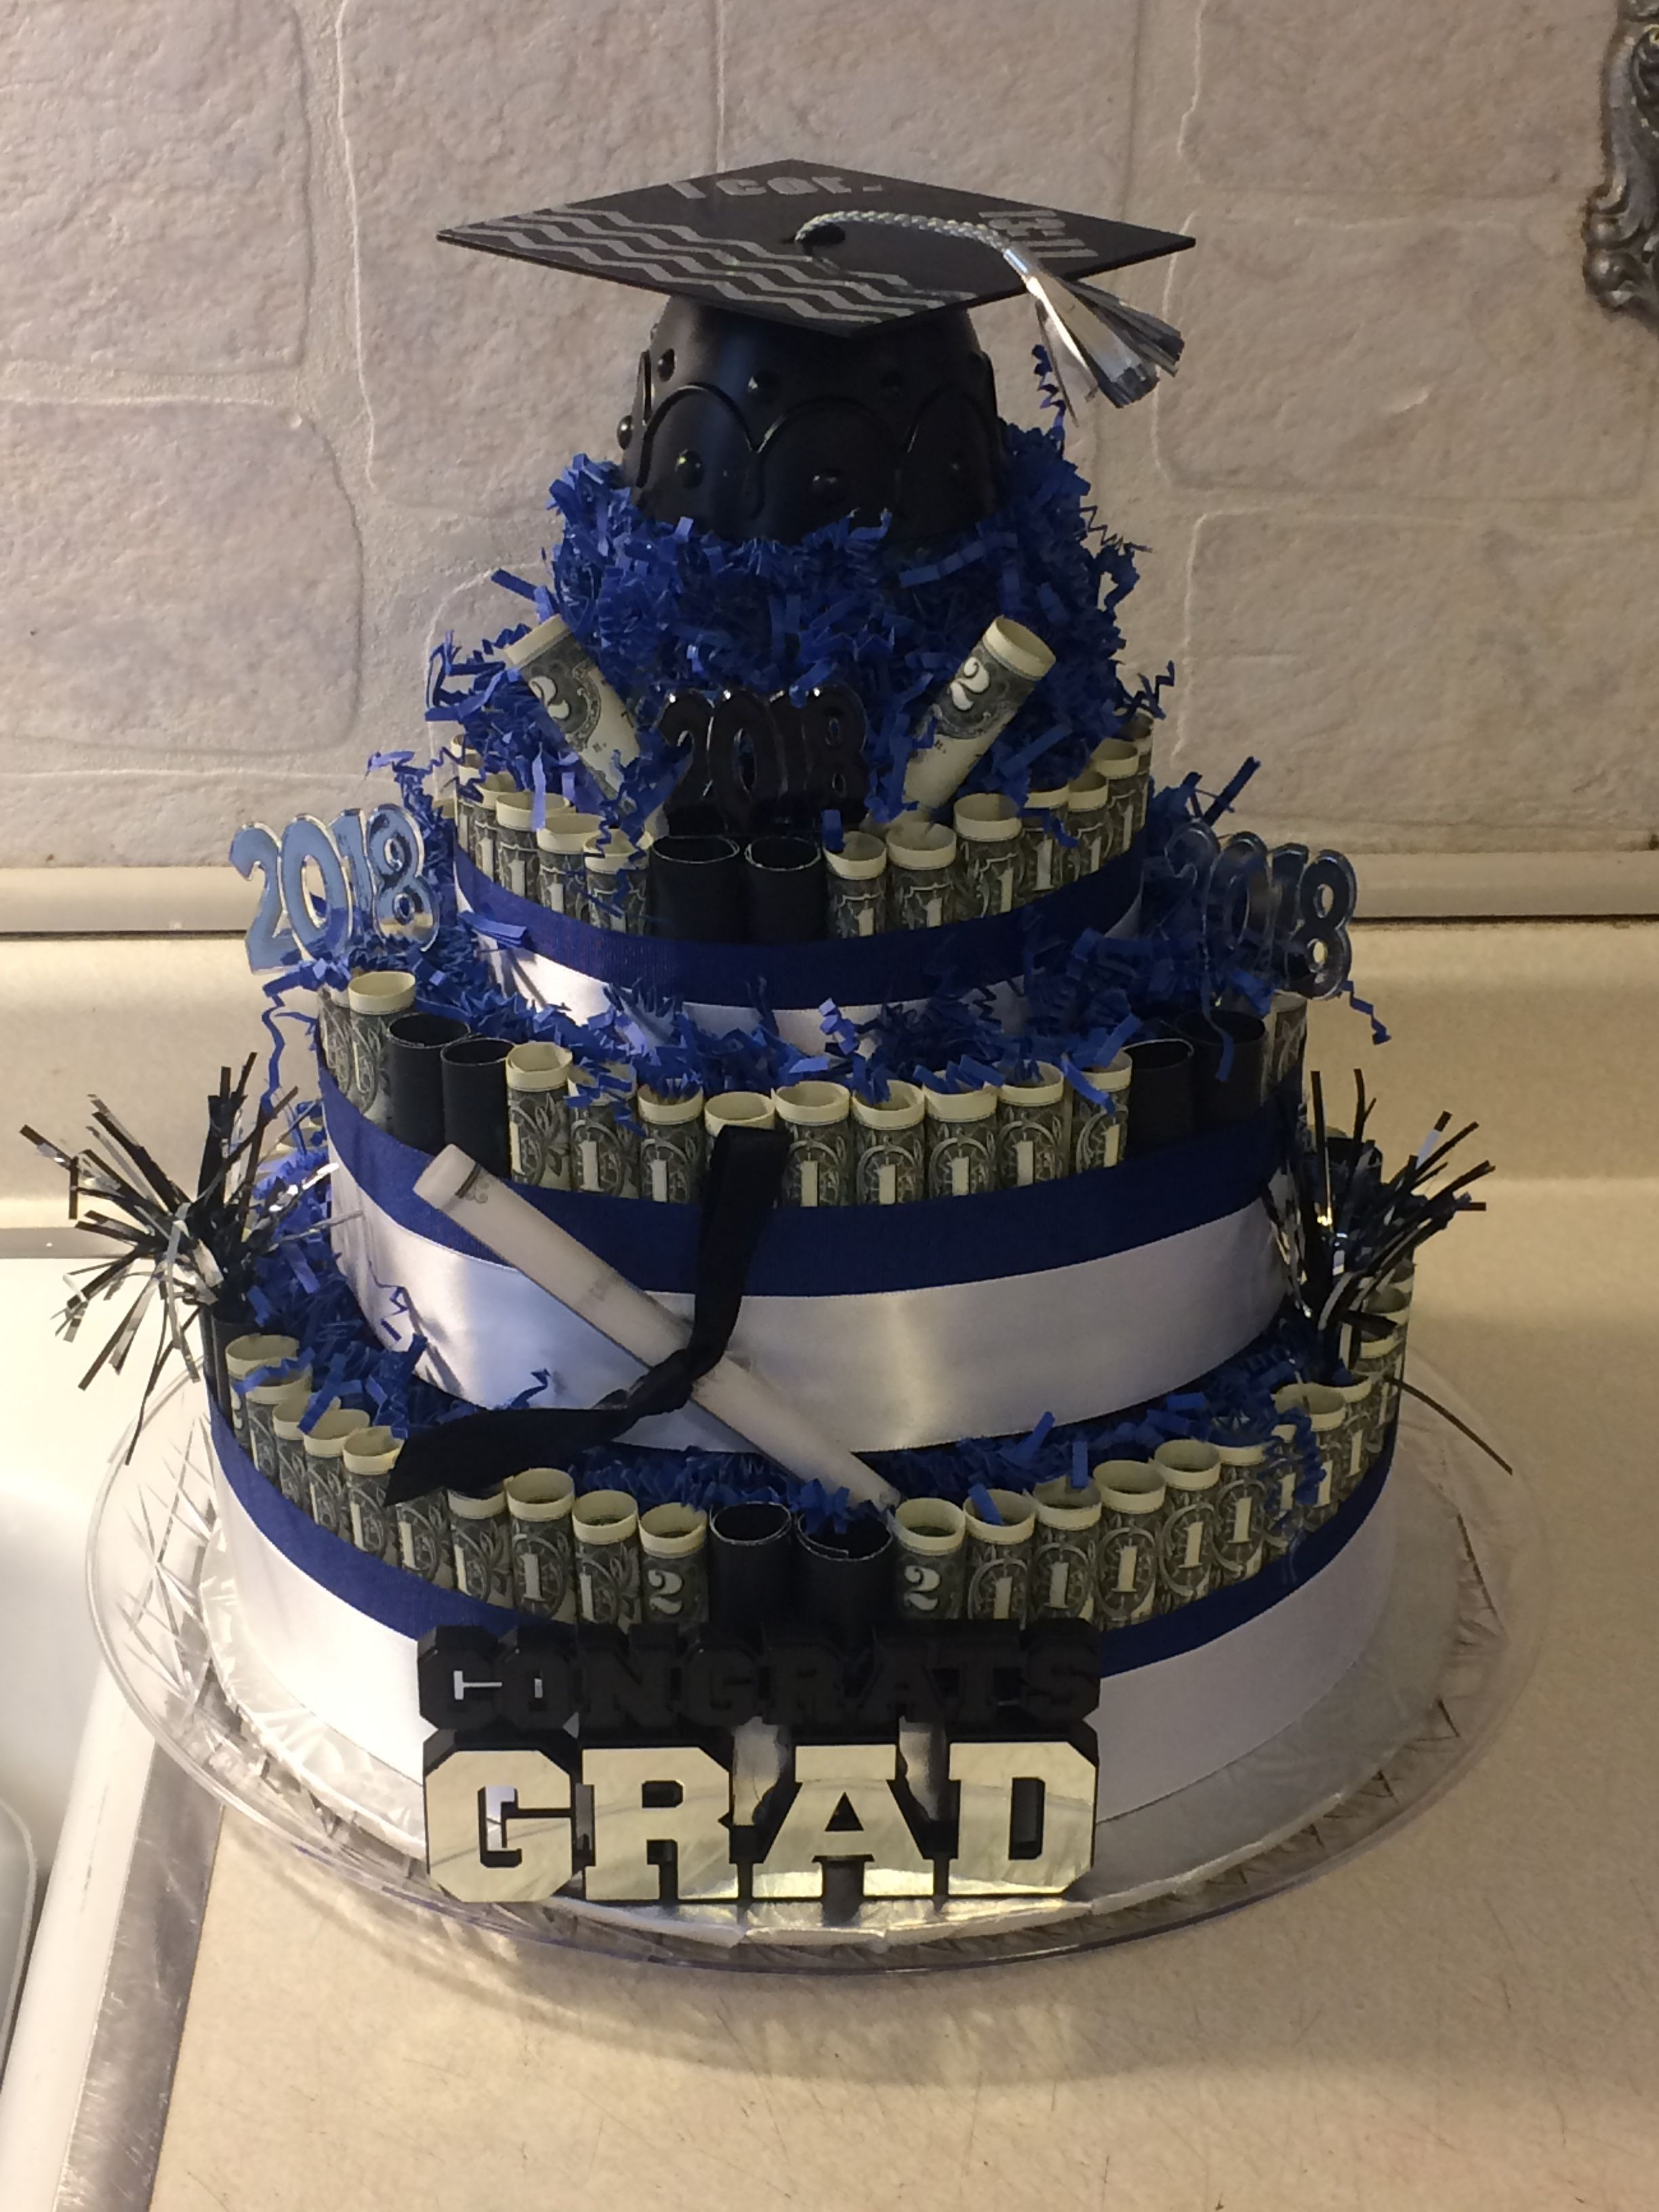 Graduation Cake 2020 Ideas Graduation money cake | Graduation 2020 | Graduation decorations